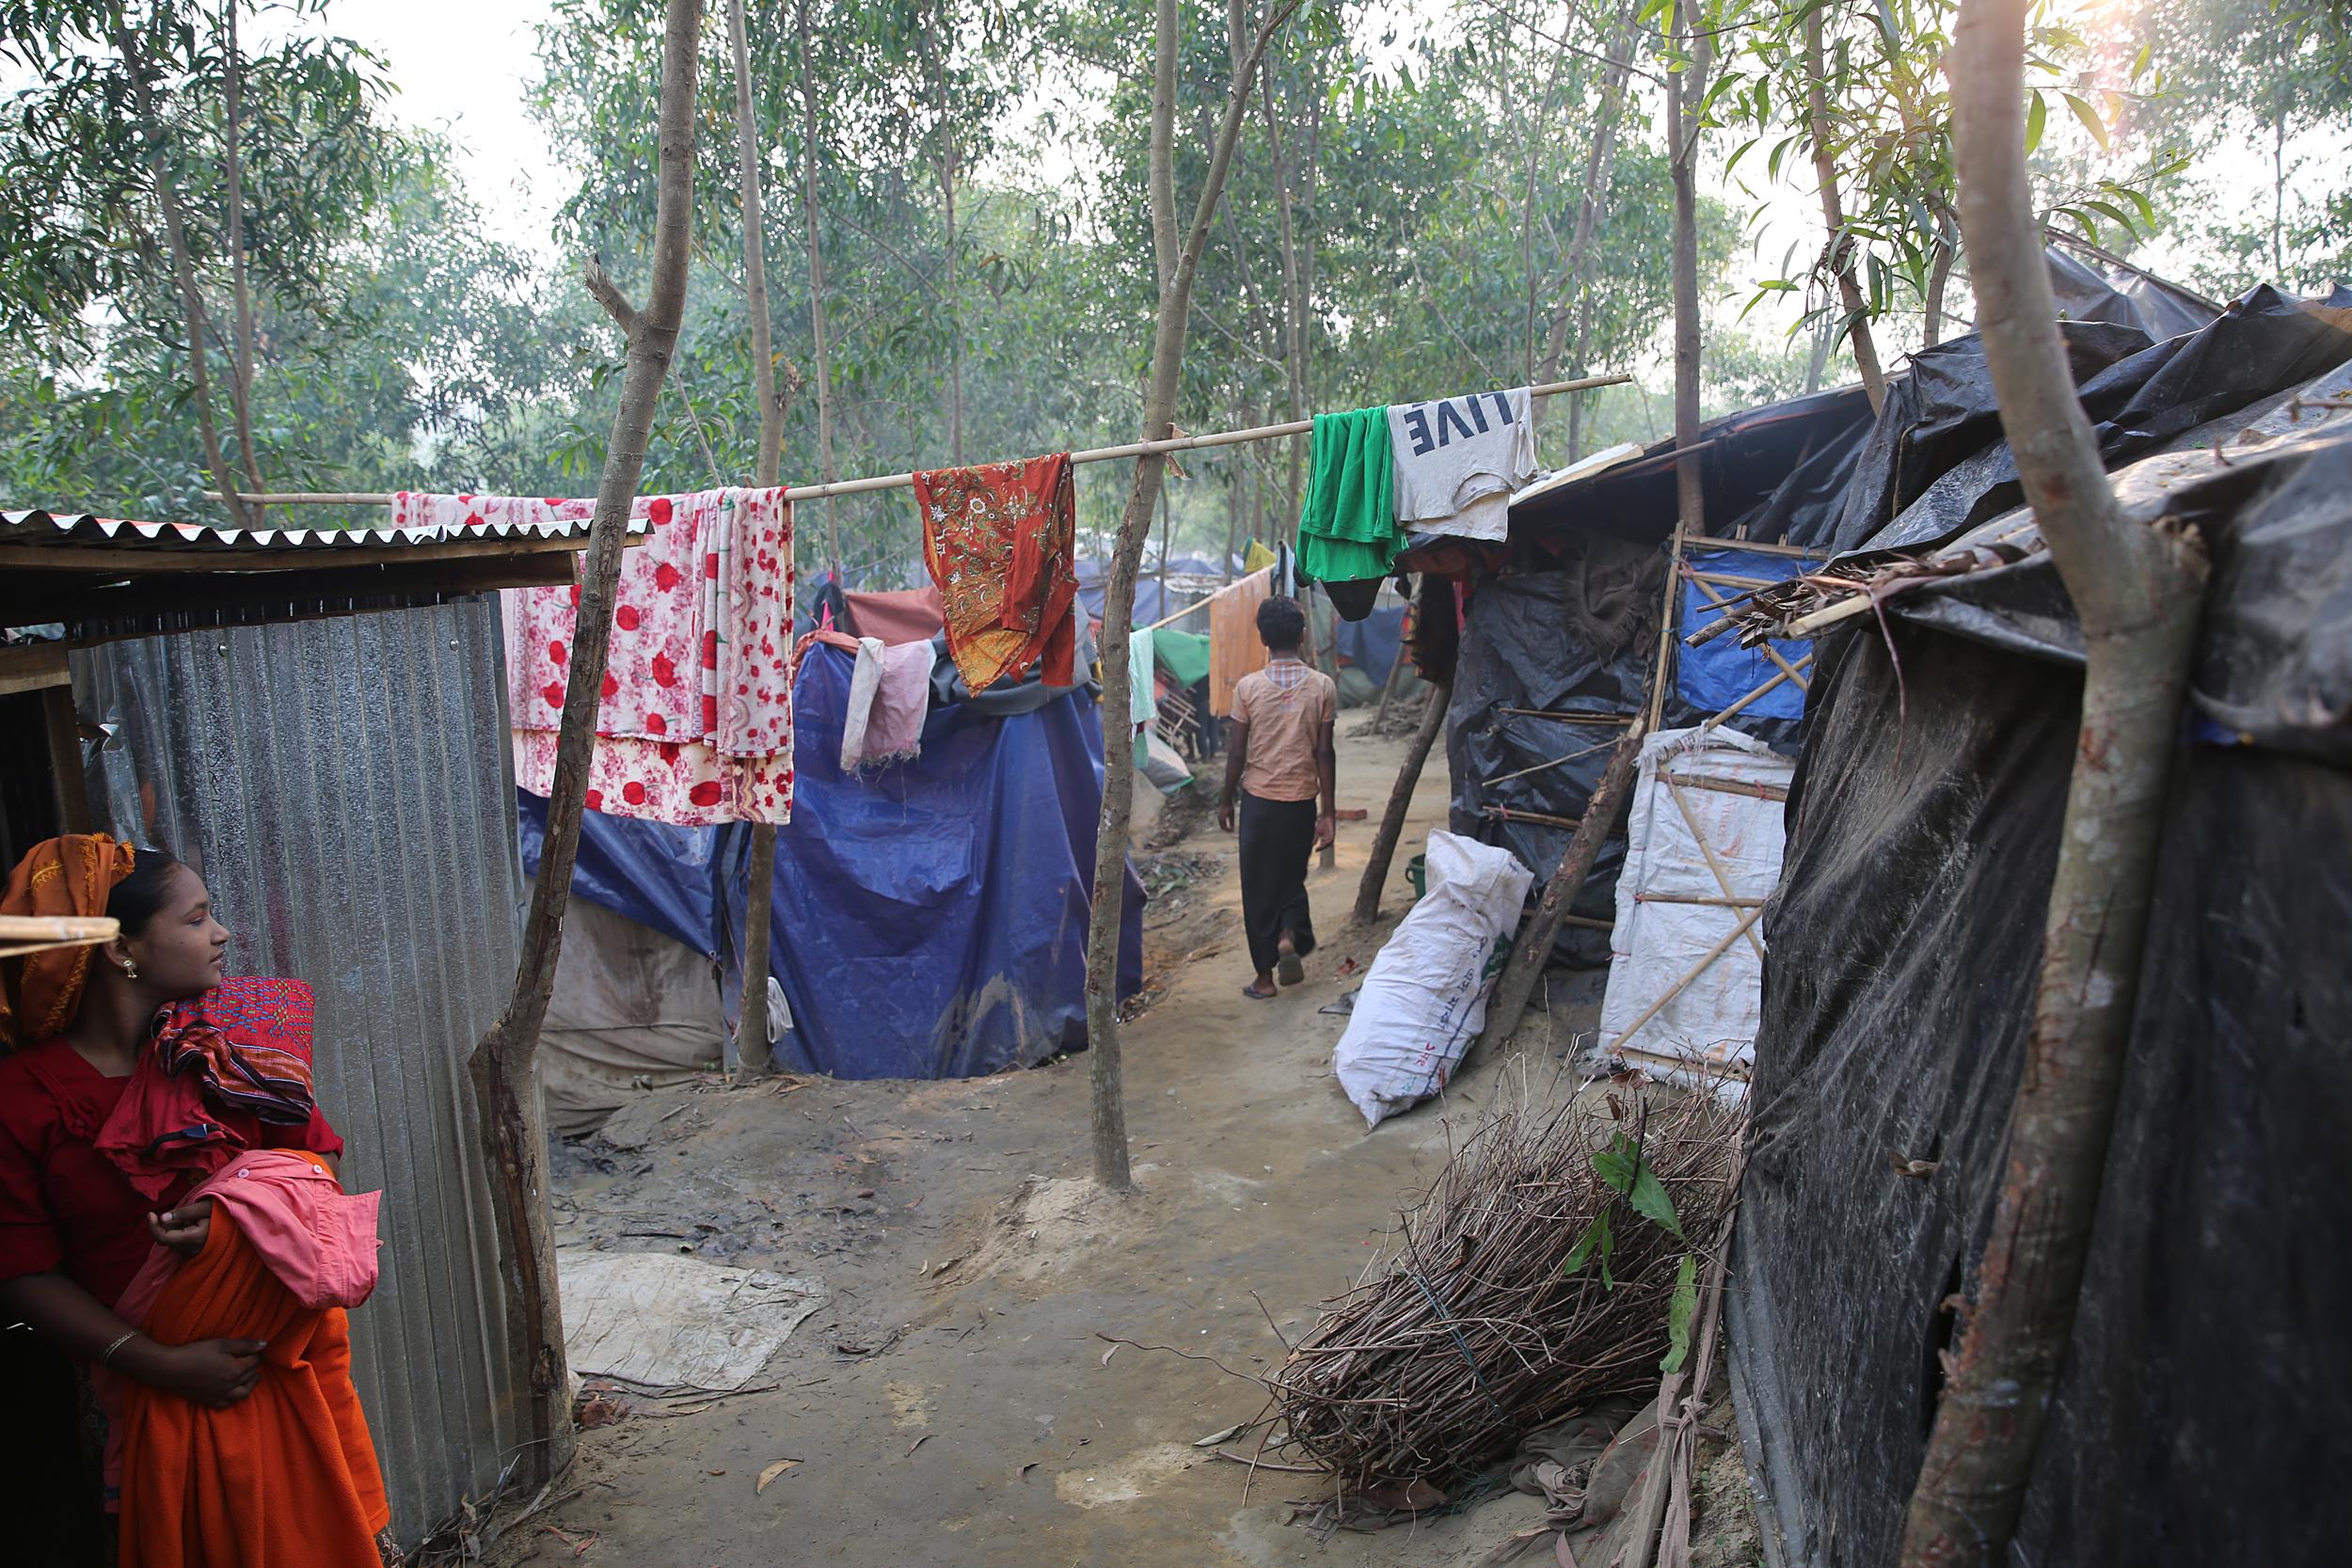 Rohingya refugees tell harrowing tales of rape